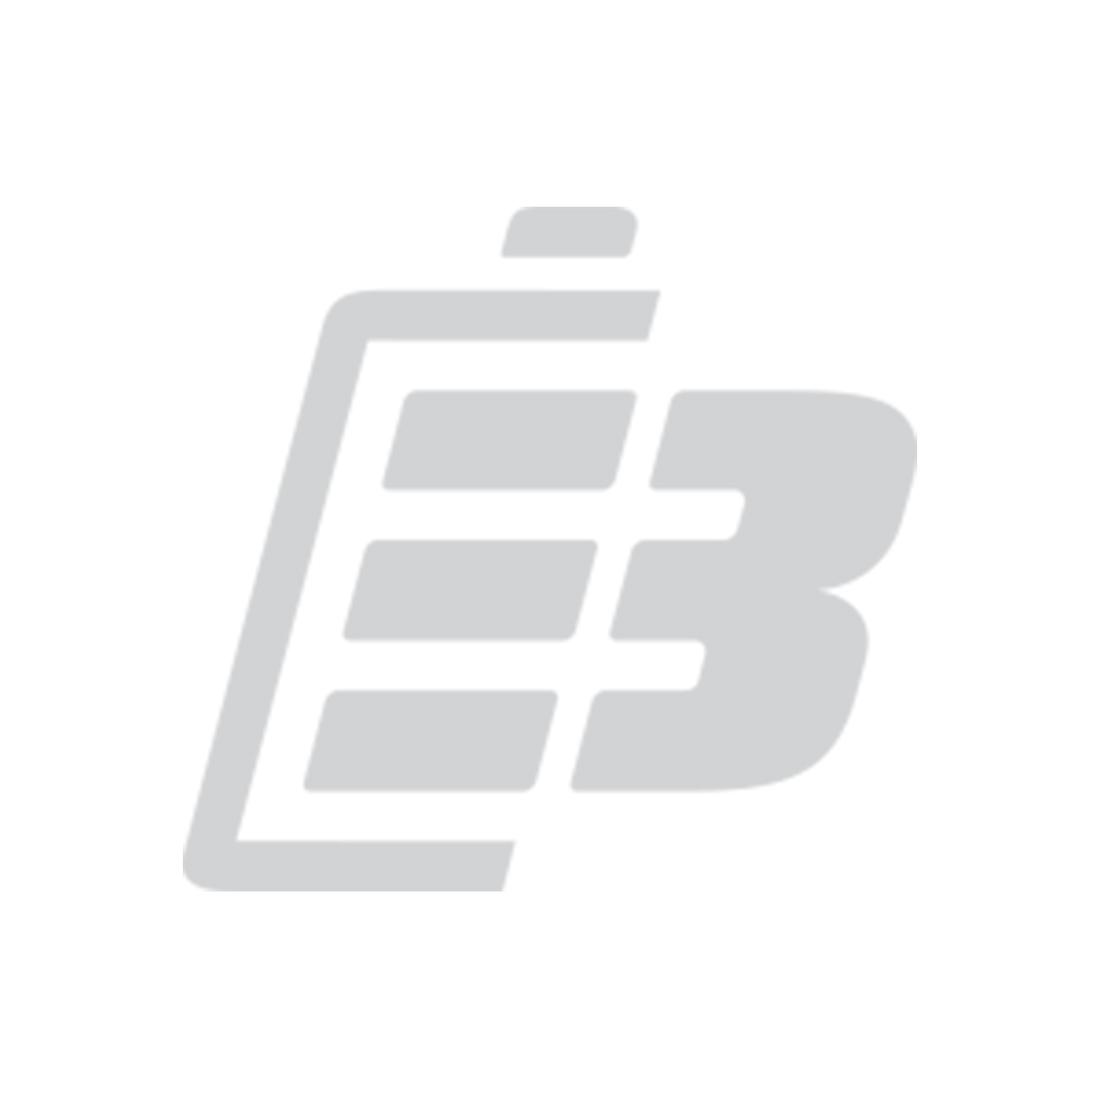 Fenix ARB-L18 18650 Battery 2600mAh 2